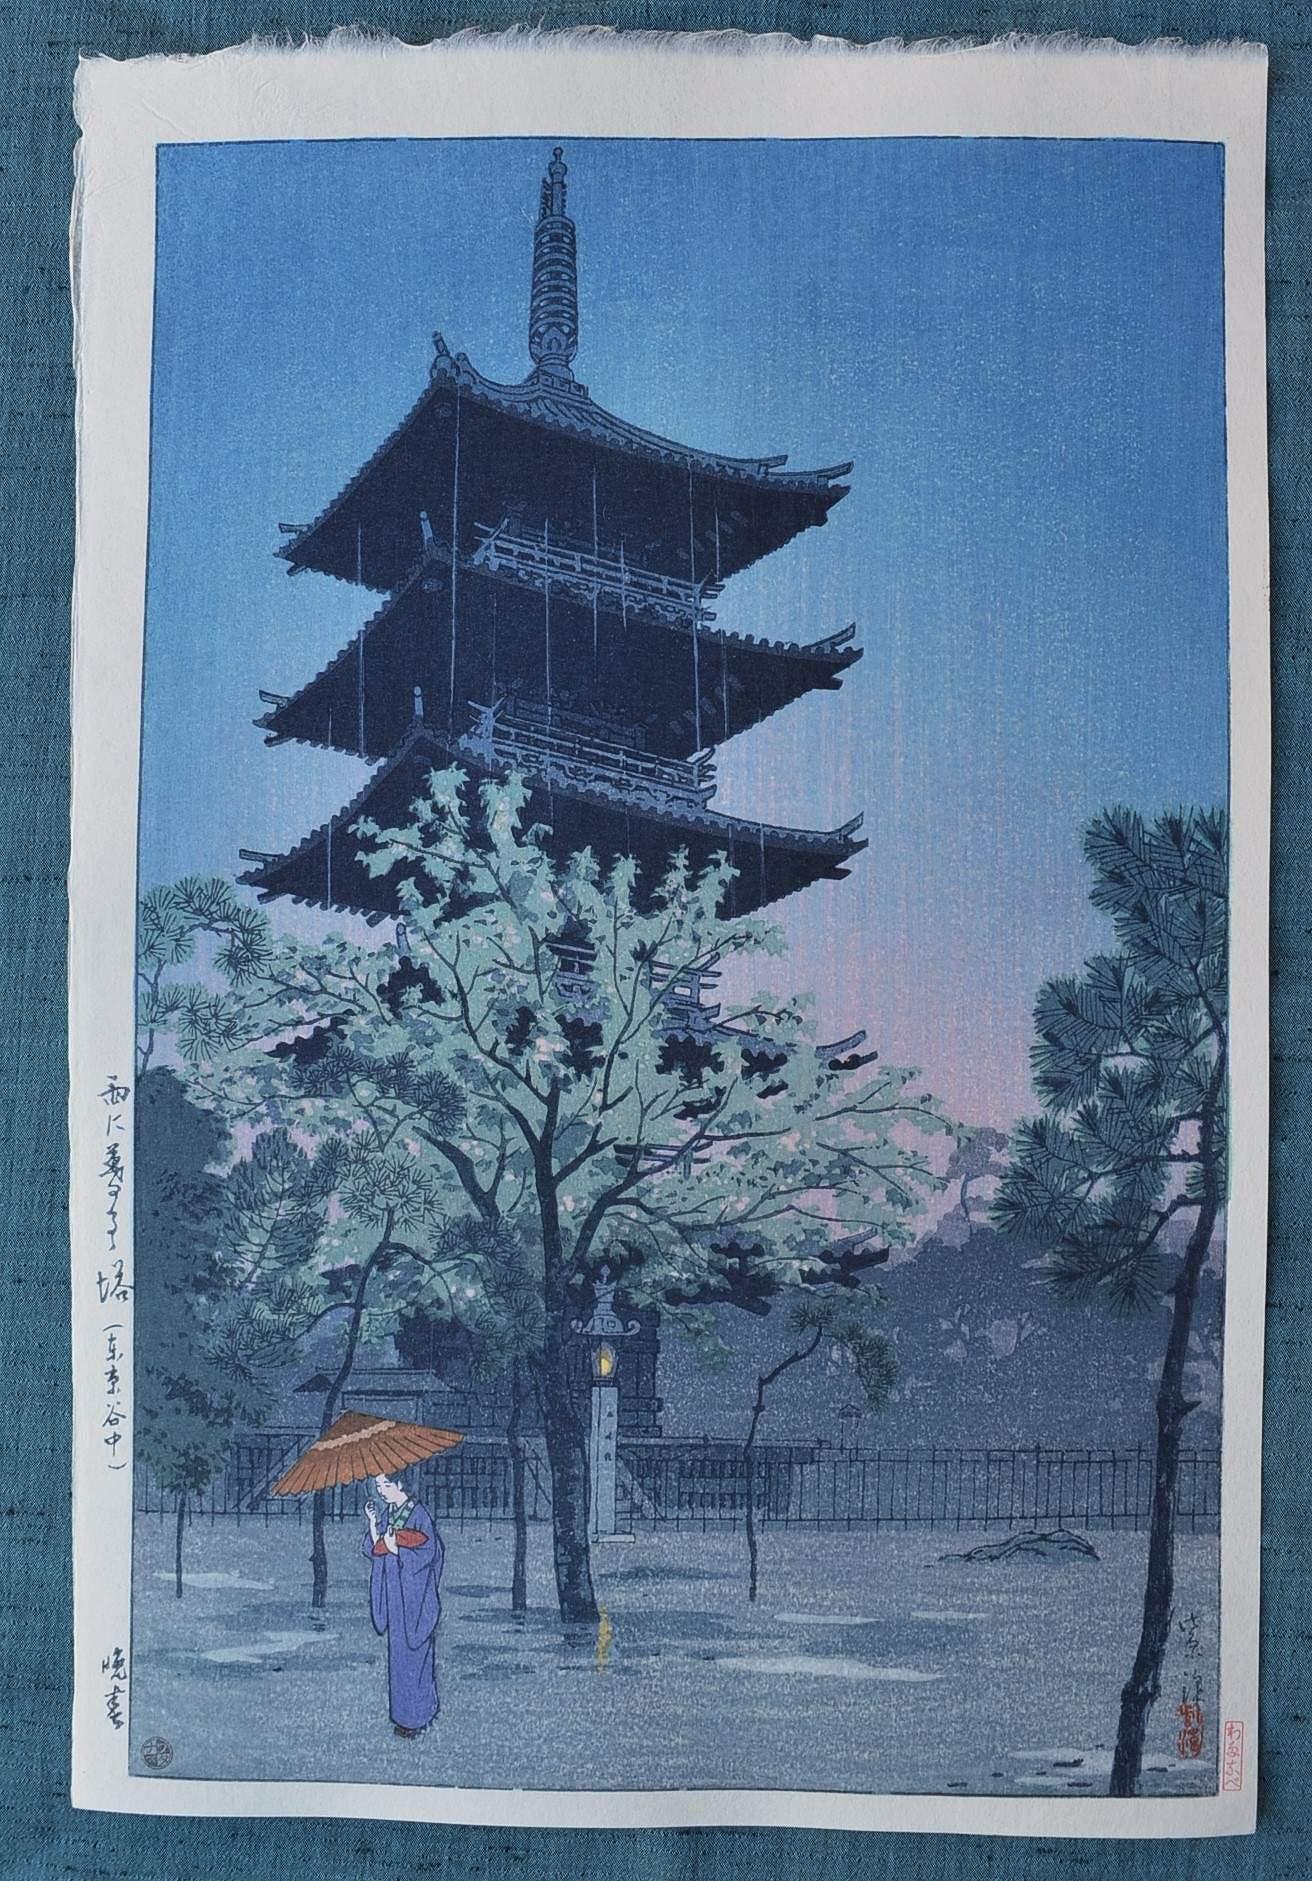 SHIRO KASAMATSU: #P4507 RAINY EVENING AT UENO PARK, YANAKA